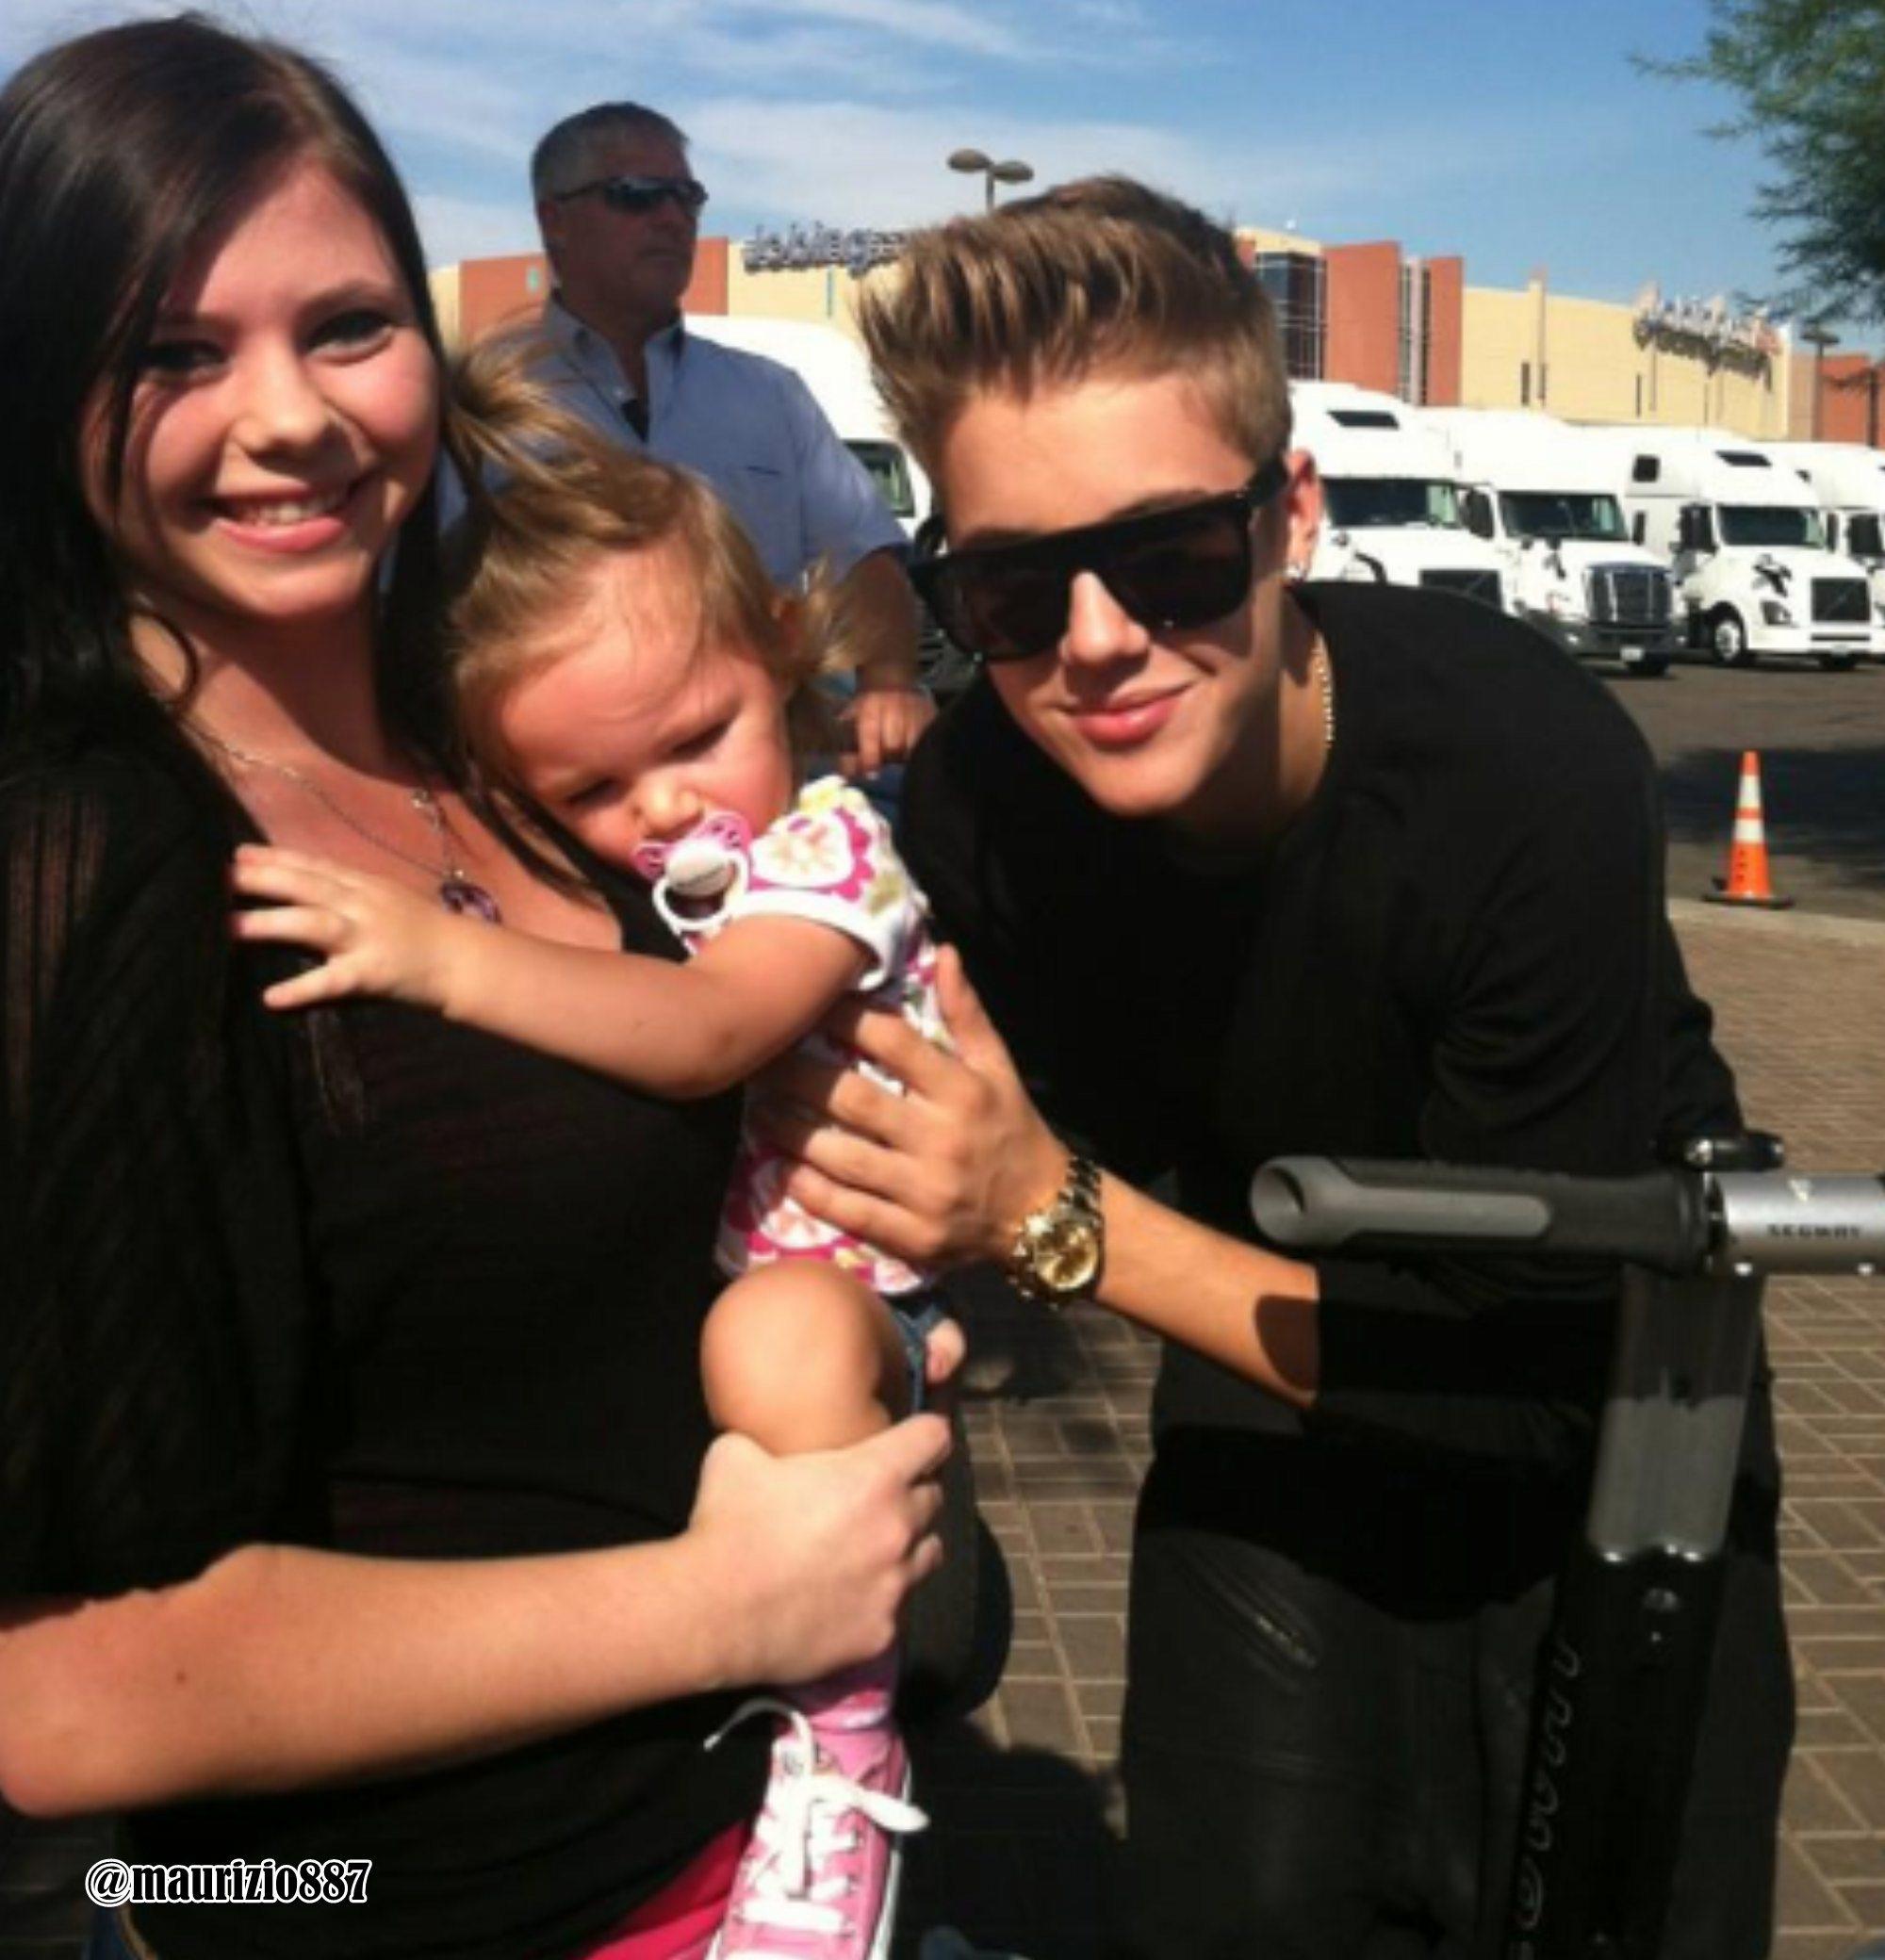 Justin bieber dating a fan